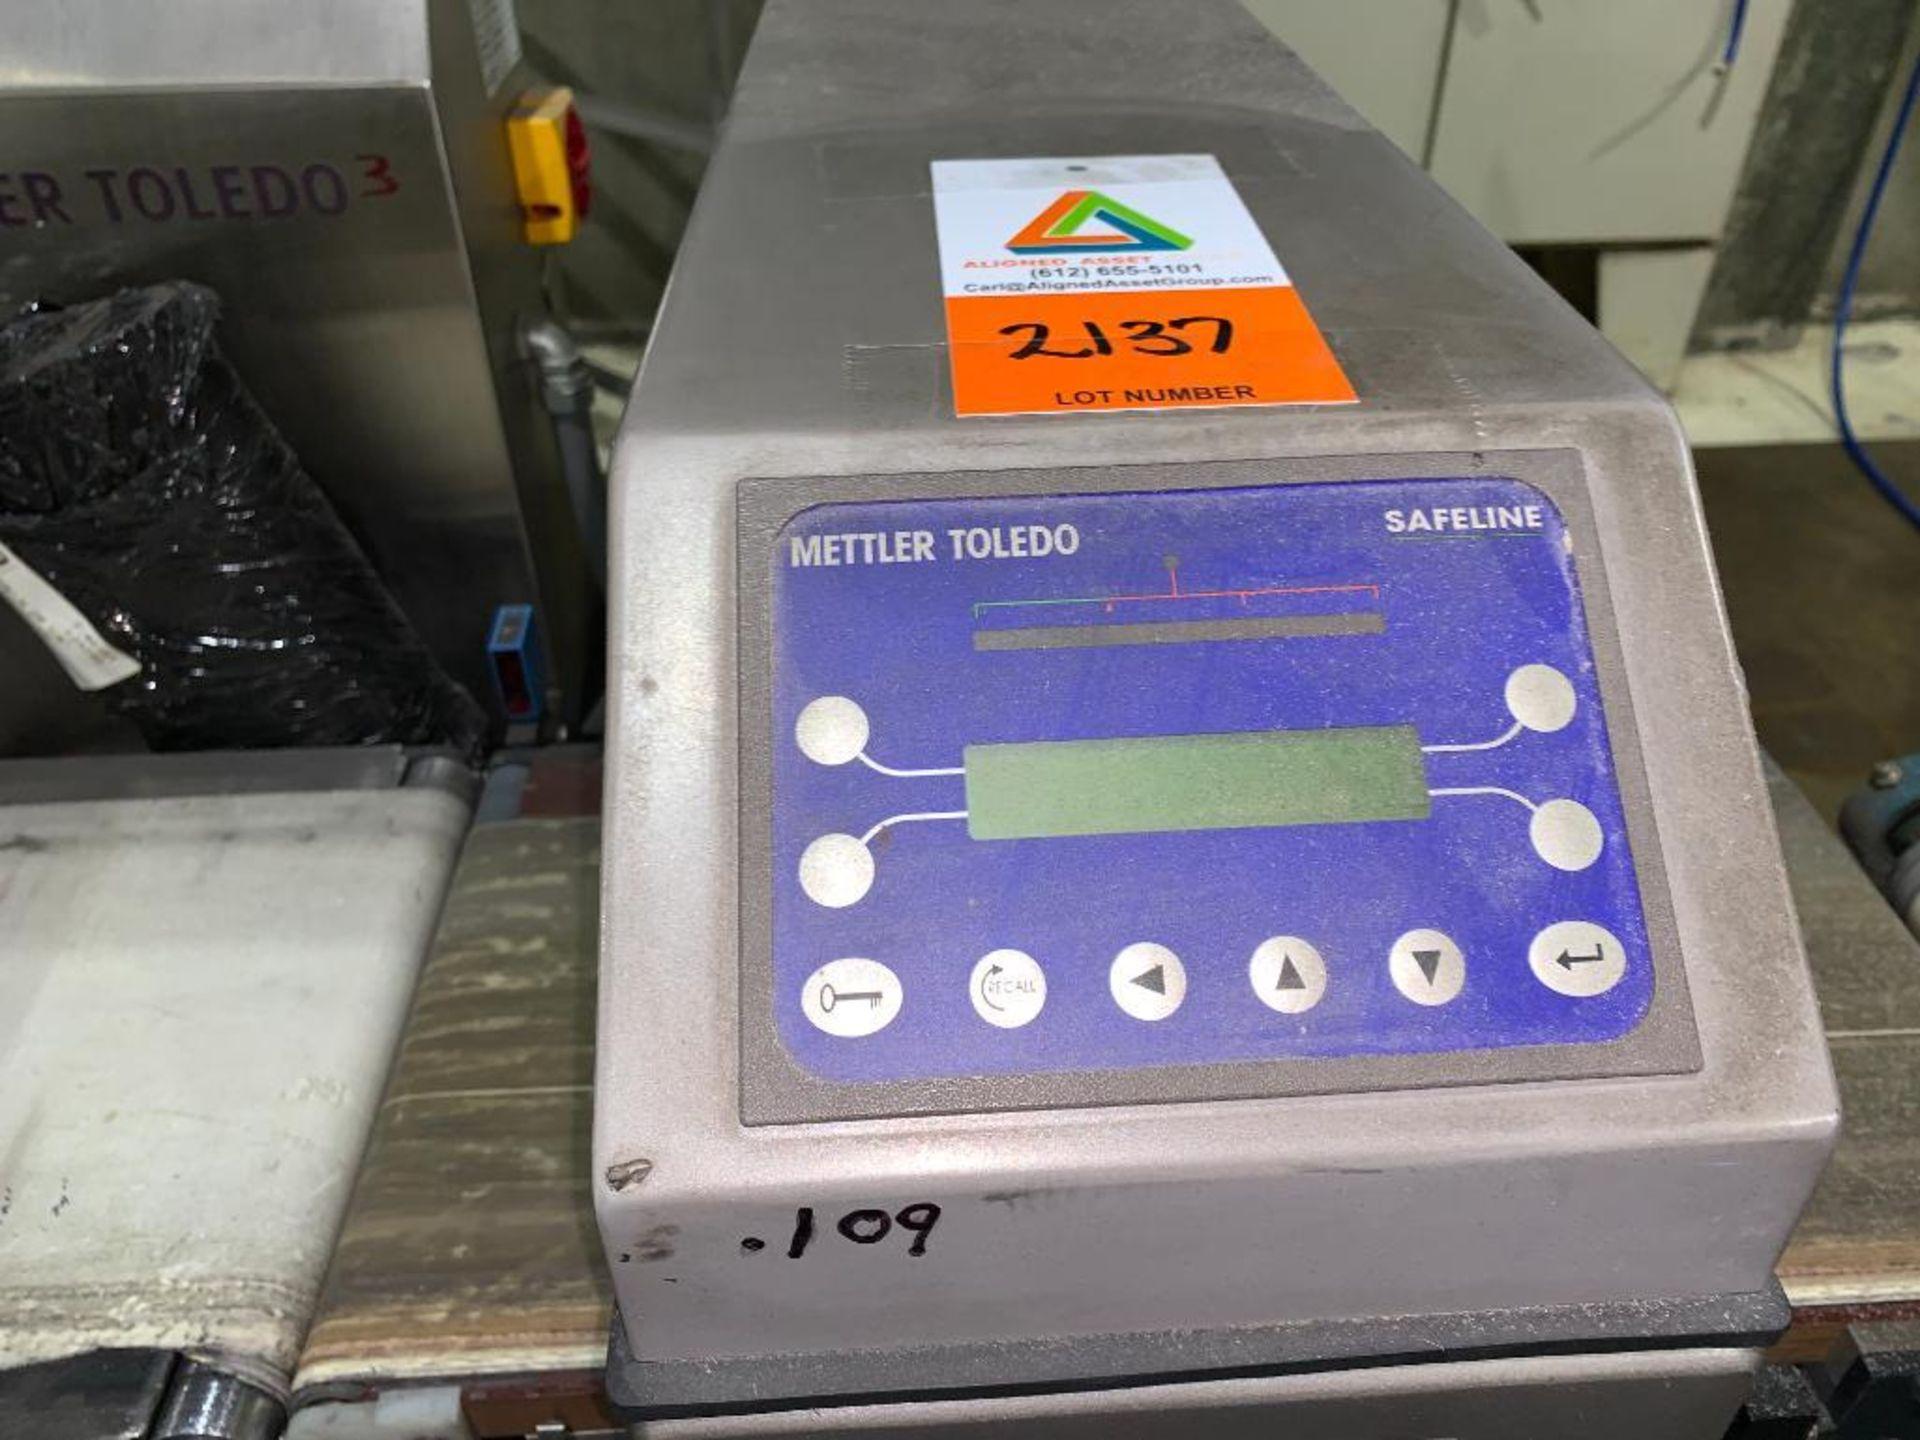 Mettler Toledo CombiChecker combination metal detector and checkweigher, model XE3 - Image 17 of 25